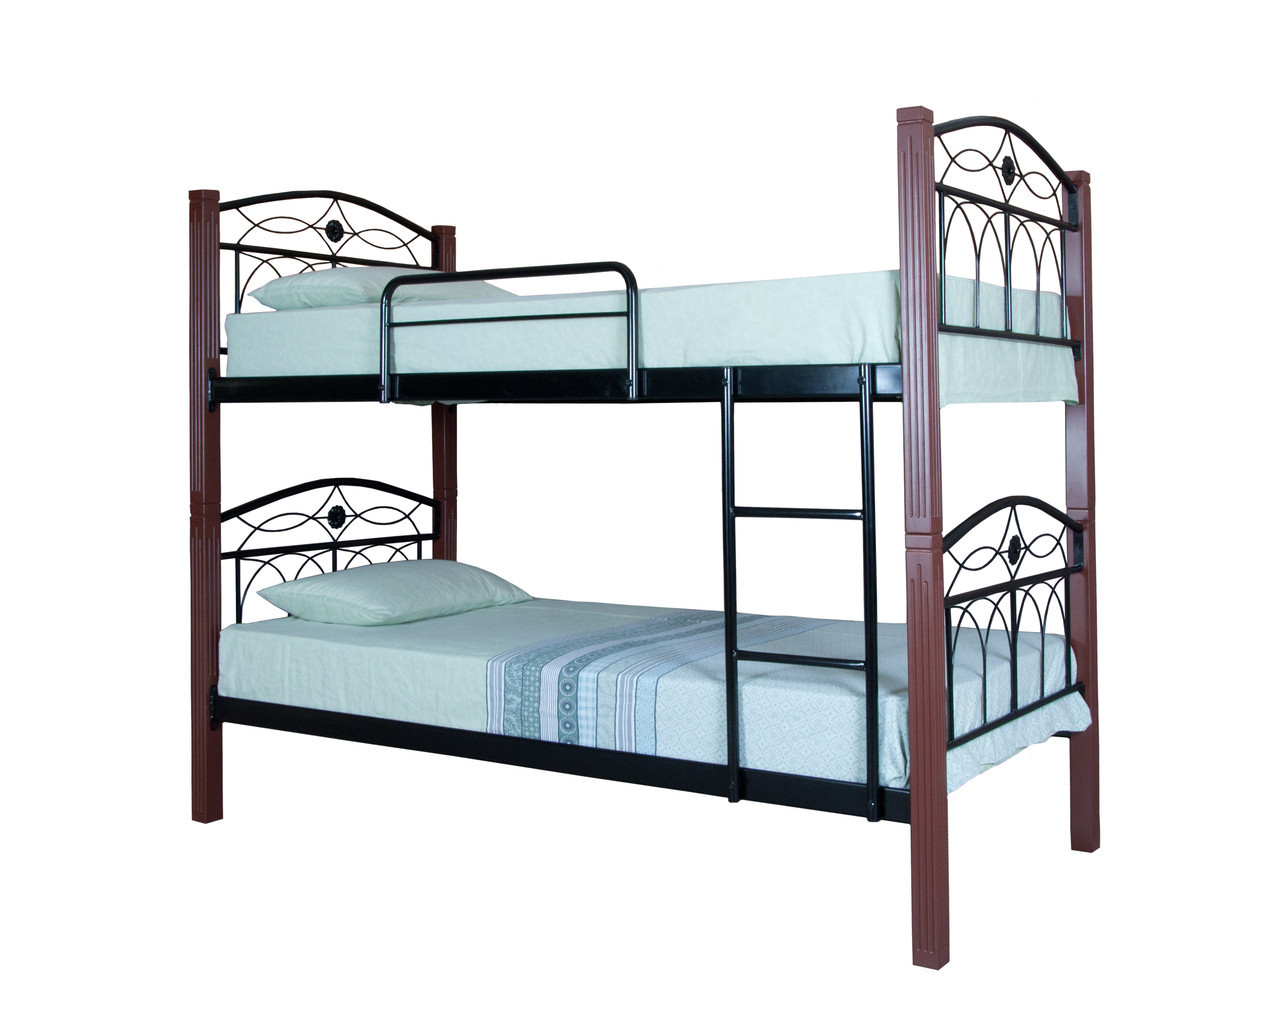 Кровать Элизабет двухъярусная  190х90, белая